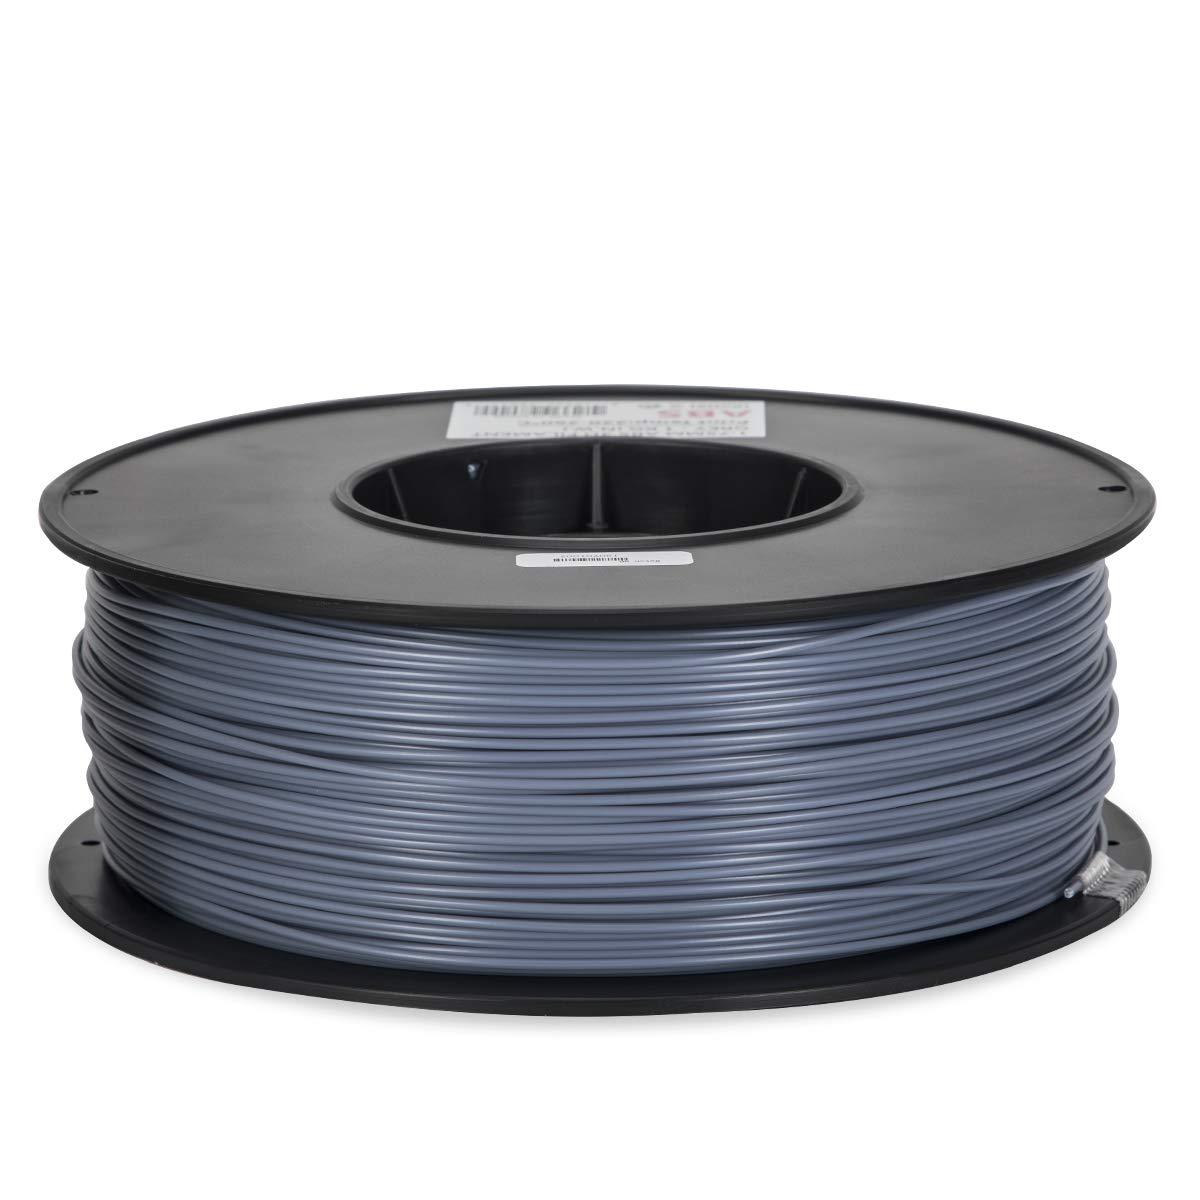 PLA Filament - 1.75 - Grey - Inland